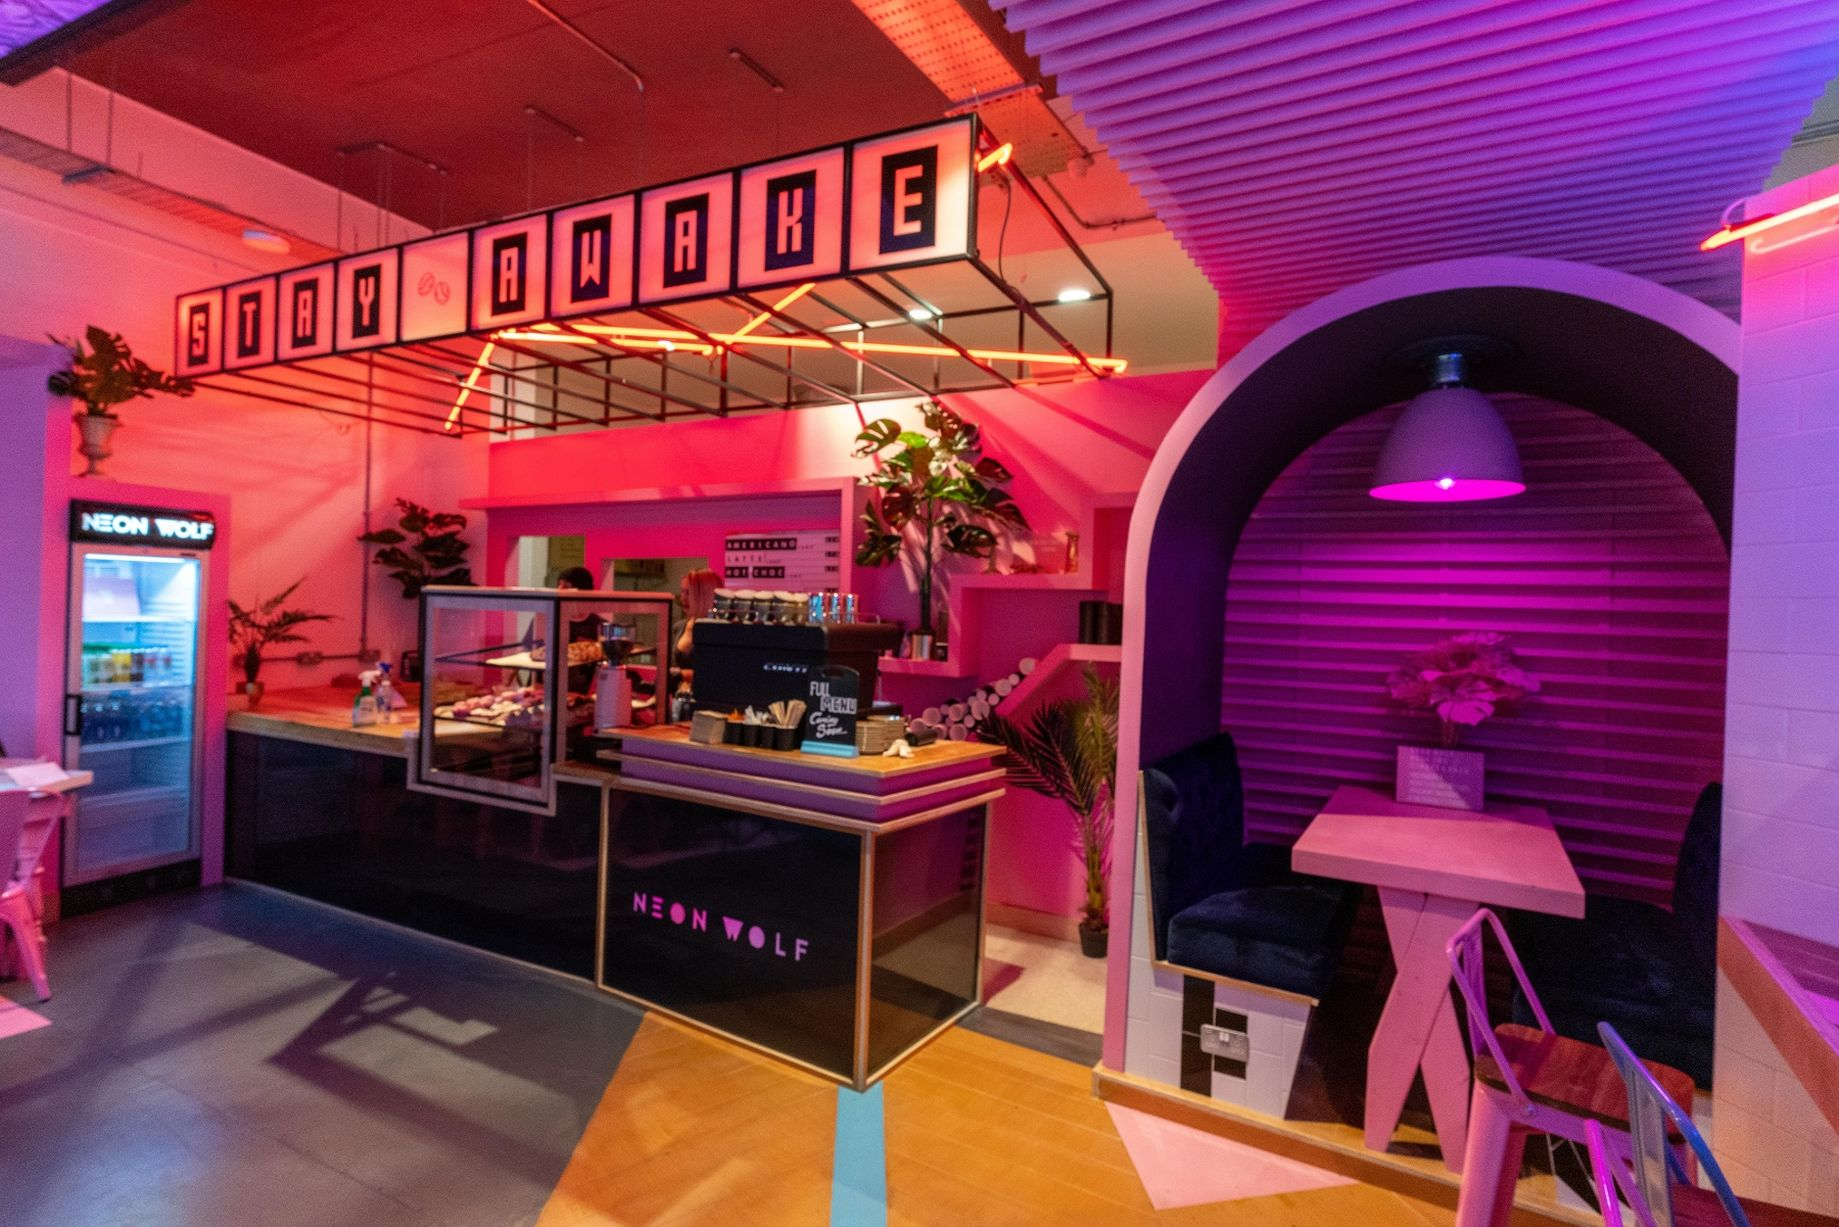 Neon wolf studio